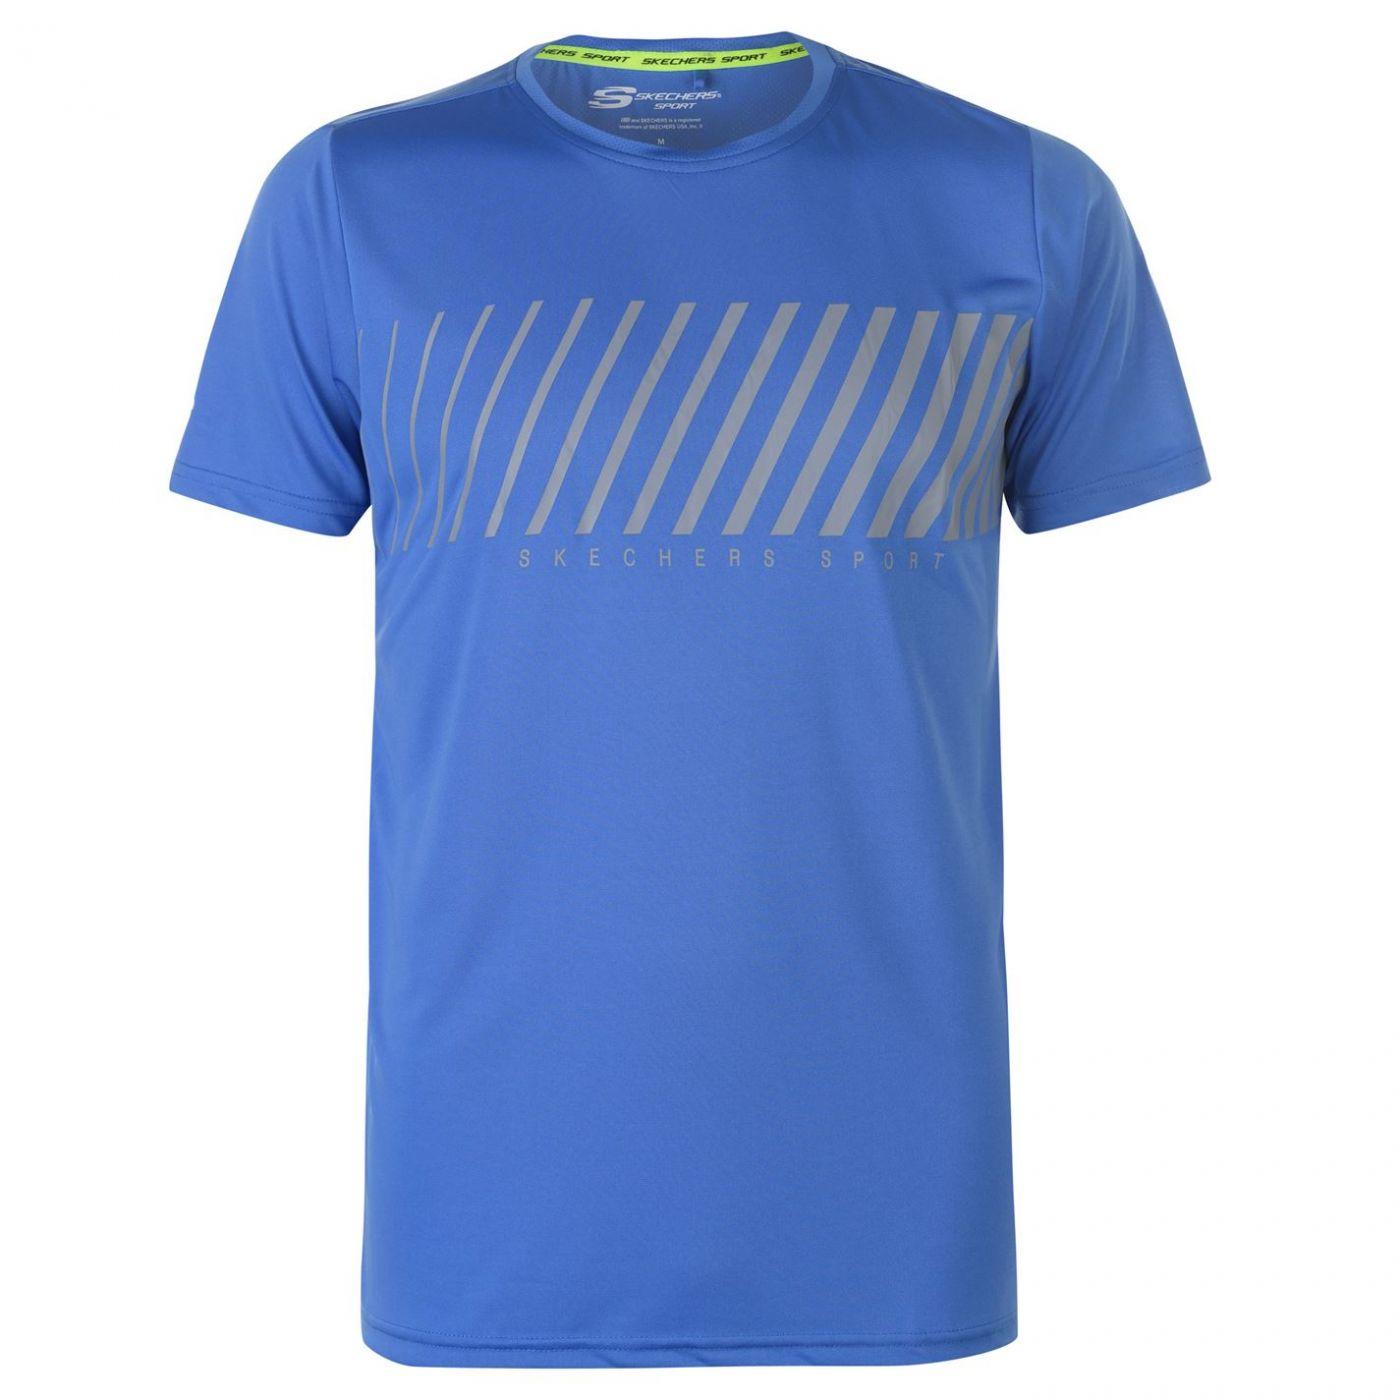 Skechers Graphic T Shirt Mens